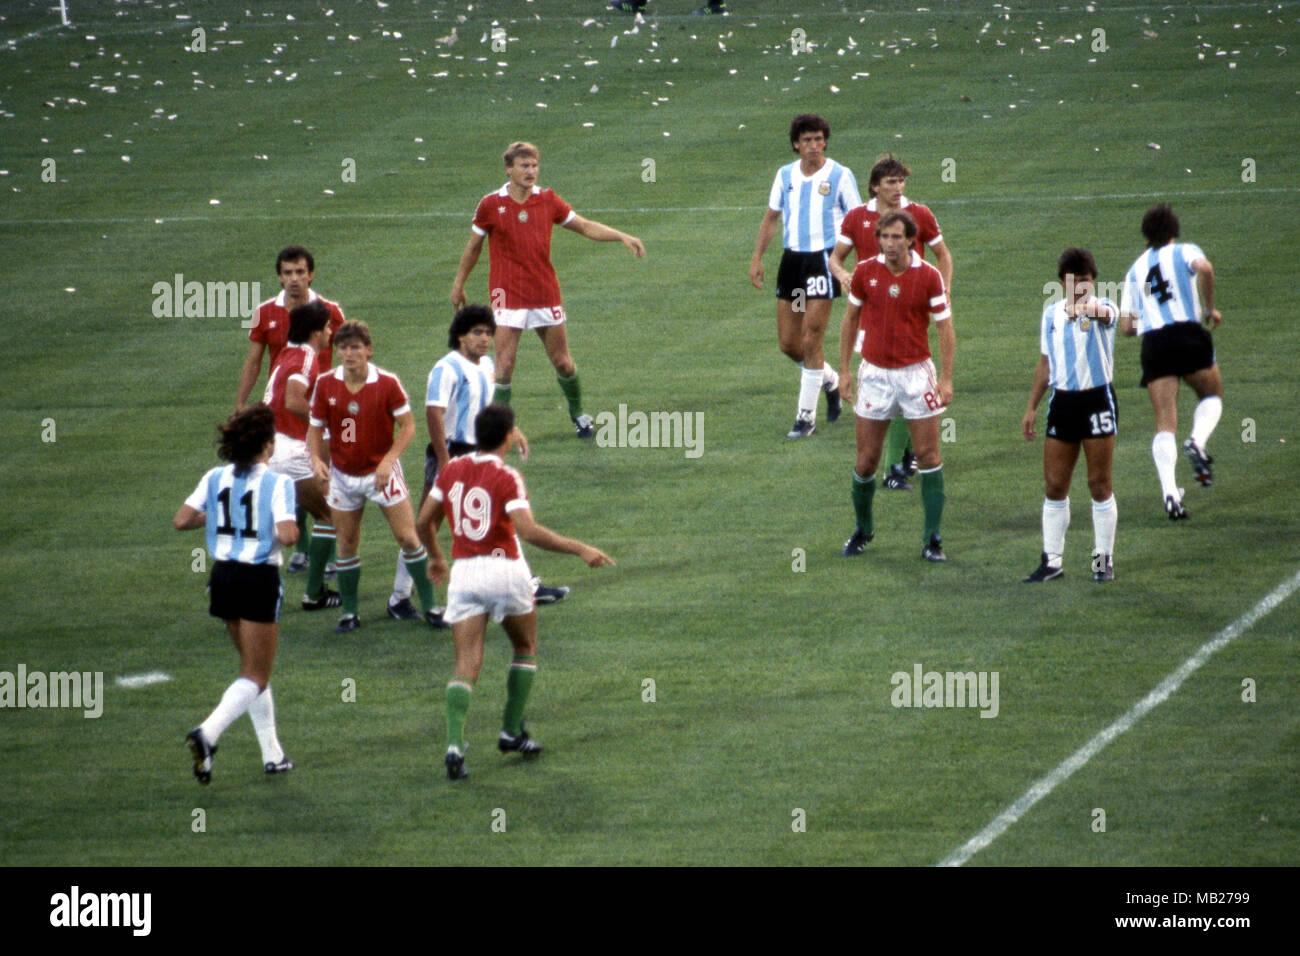 Mario kempes photos mario kempes images alamy - Finale coupe du monde 1978 ...